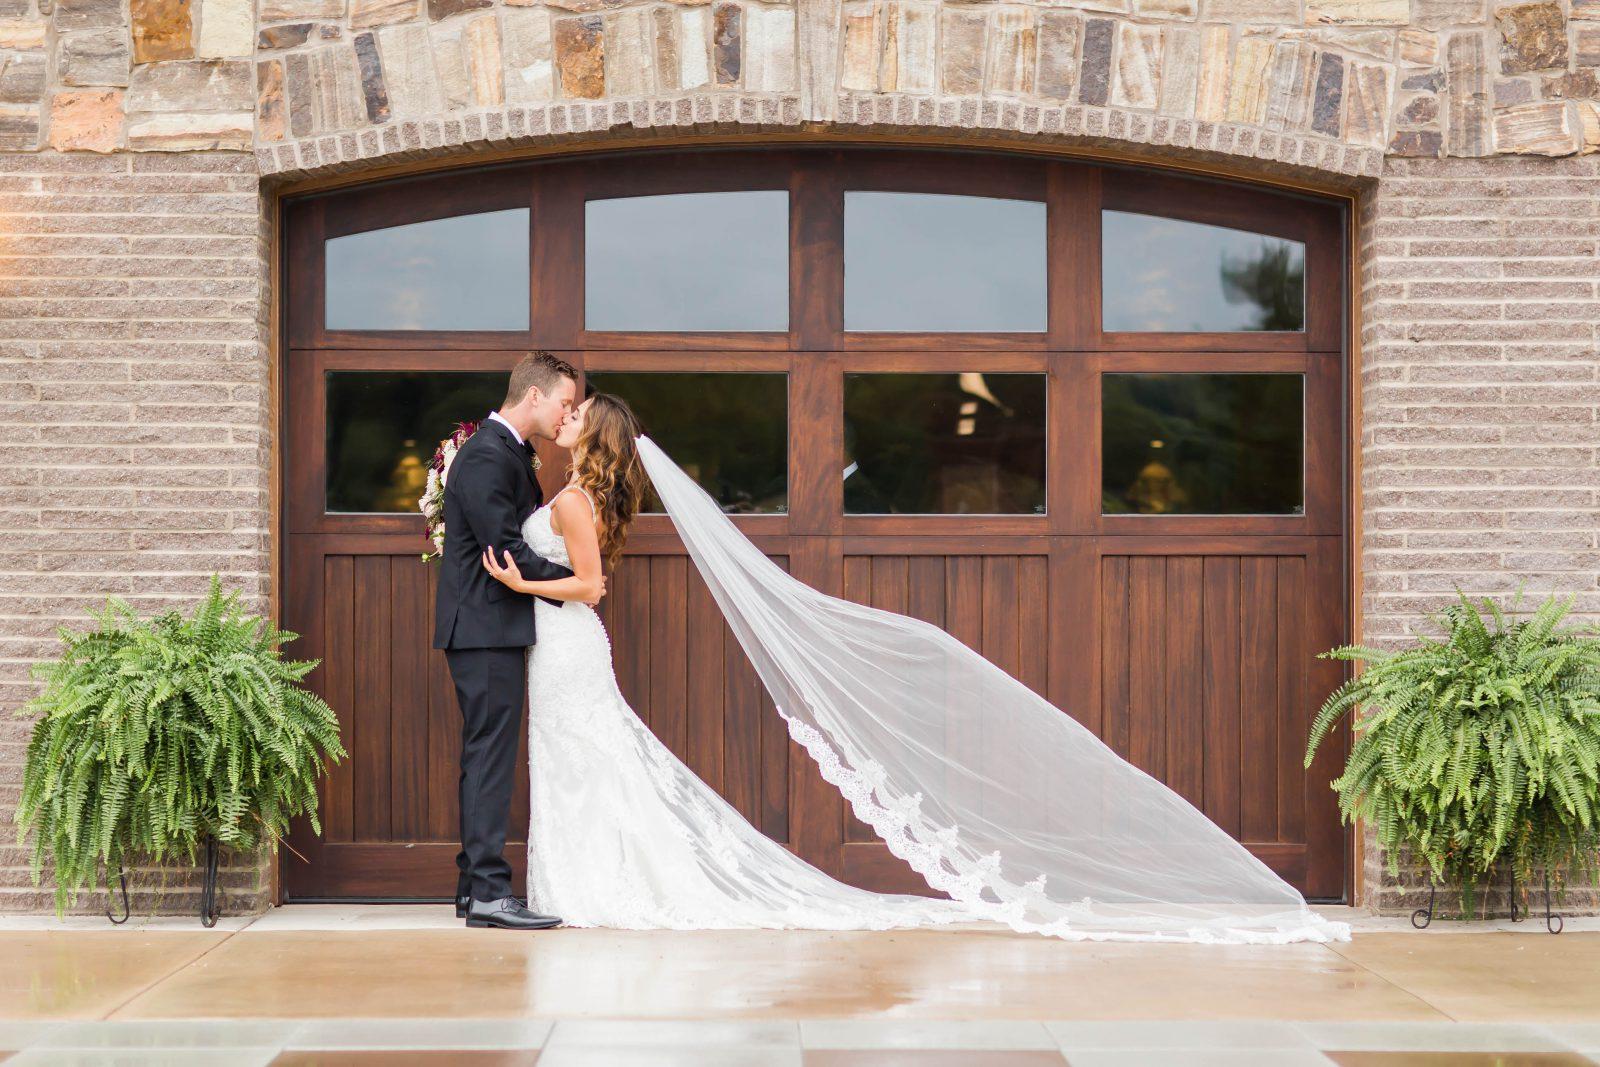 sunny-hill-wedding-venue-loren-jackson-photography-77